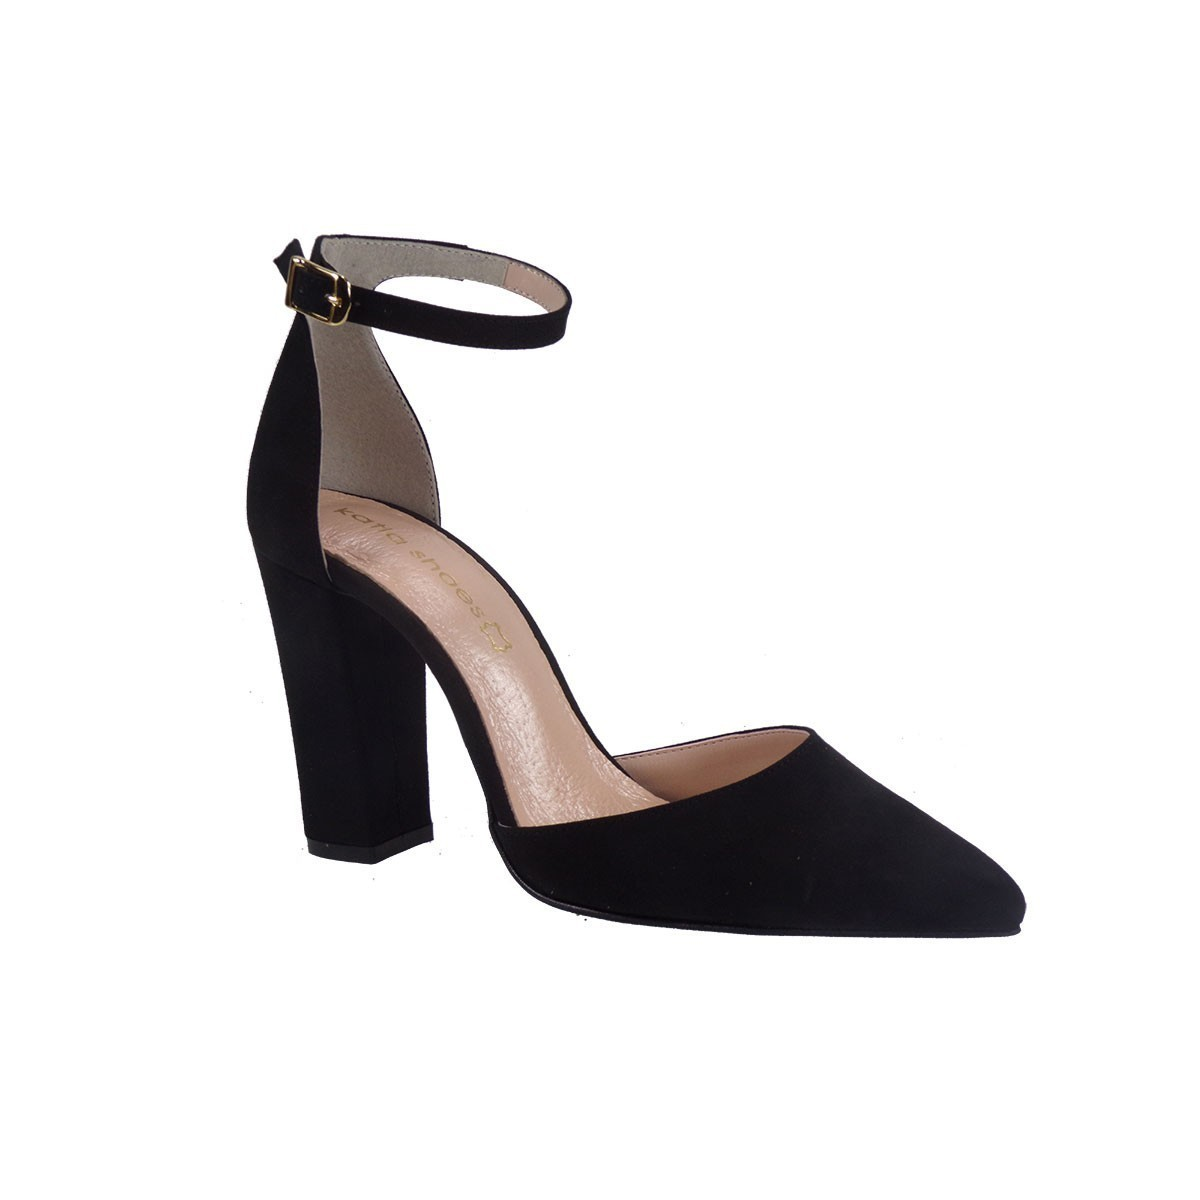 1cb112a72d3 Katia Shoes Γυναικεία Παπούτσια Γόβες 10-4972 Μαύρο Καστόρι |Γυναικεία &  Ανδρικά Παπούτσια - BagiotaShoes.gr